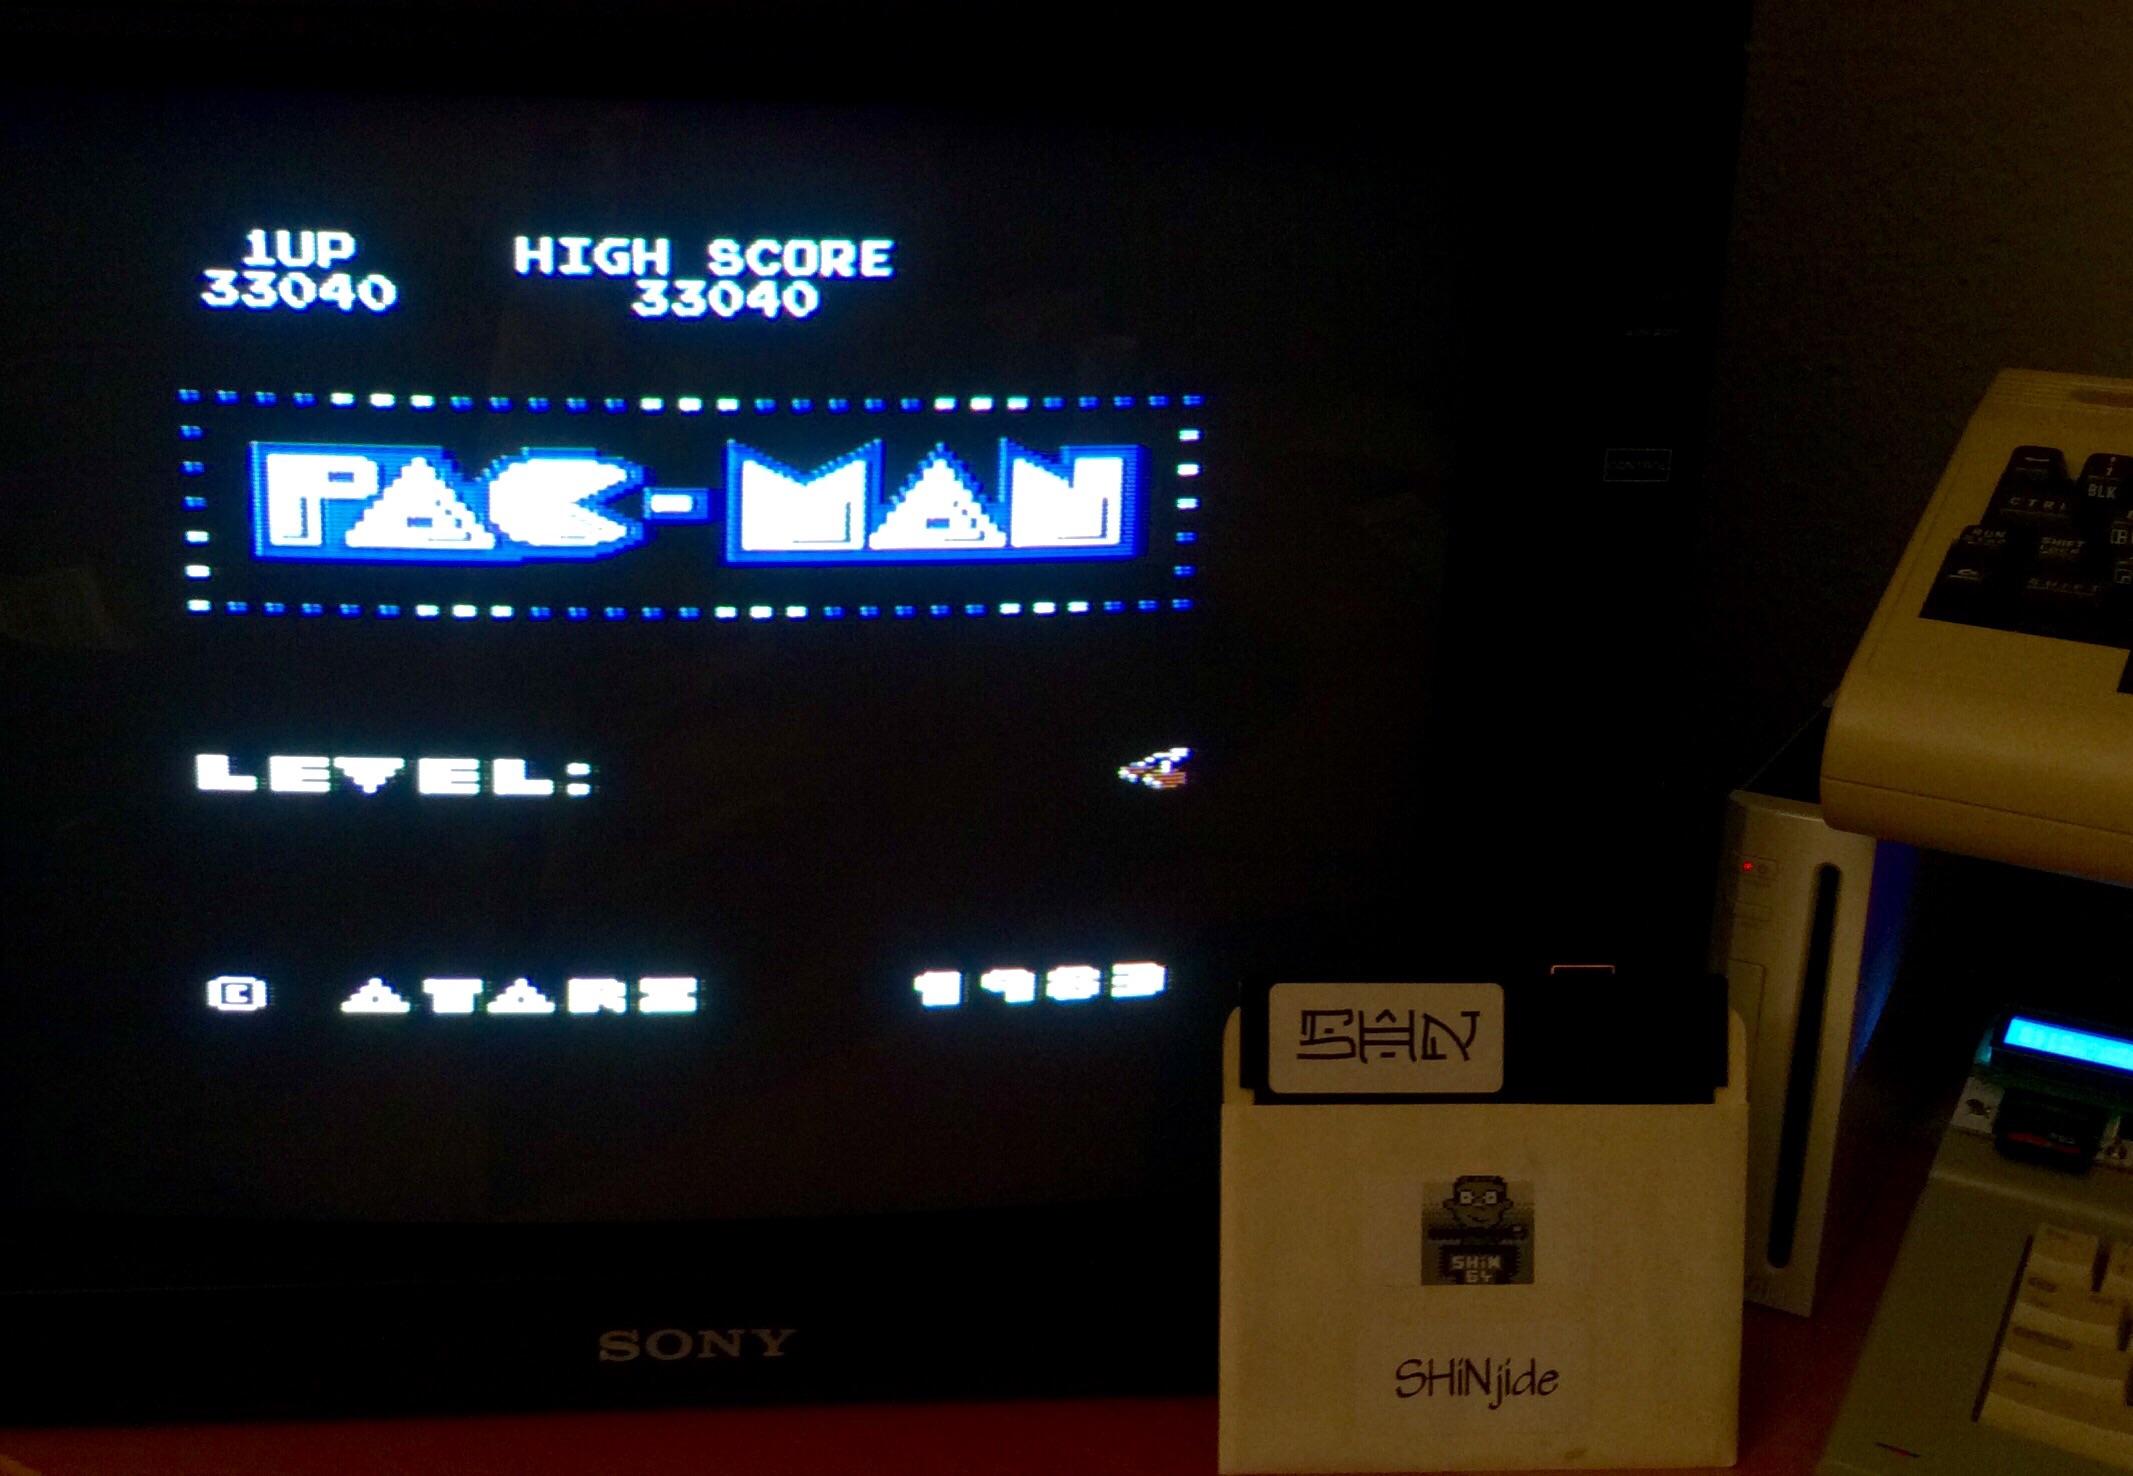 SHiNjide: Pac-Man Arcade (Atari 400/800/XL/XE) 33,040 points on 2015-02-06 15:35:23